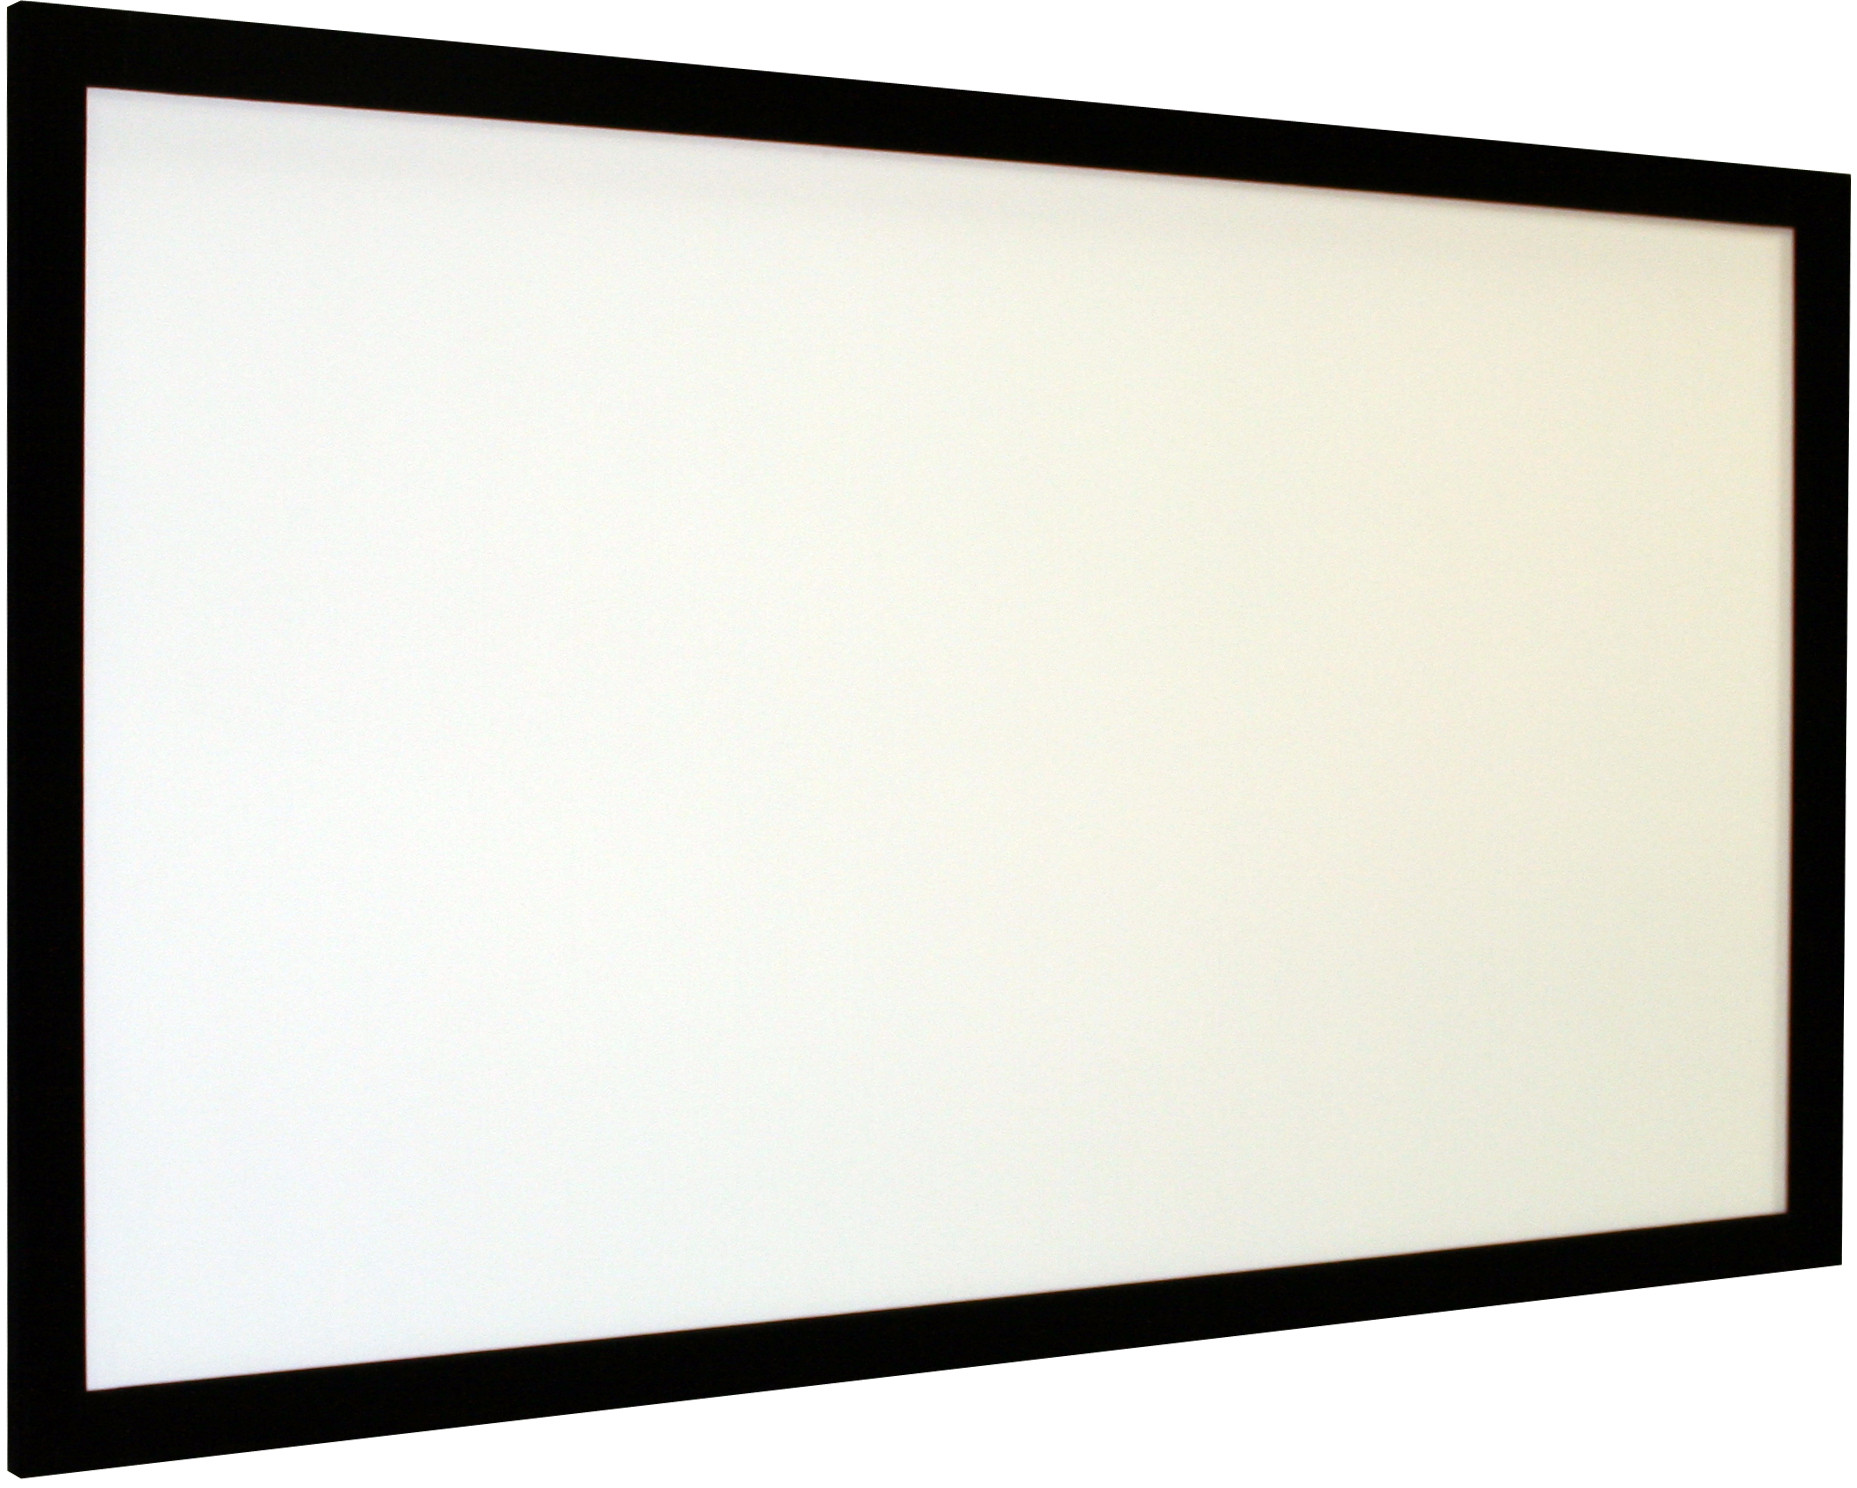 Vision Light 160 x 100 cm data format og Veltex ramme